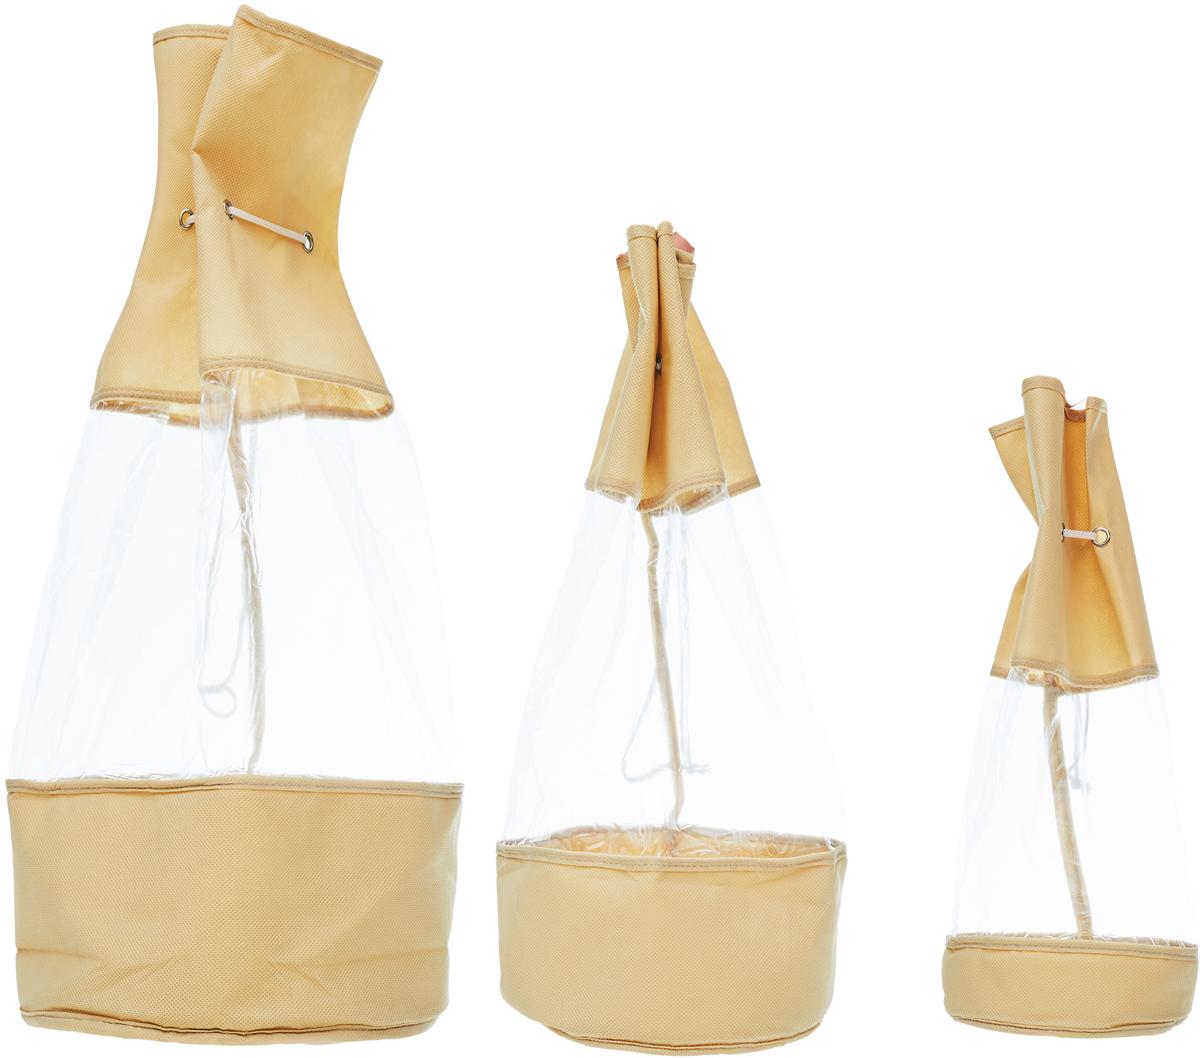 Набор мешочков Все на местах Minimalistic, цвет: бежевый, 3 предмета1011023.